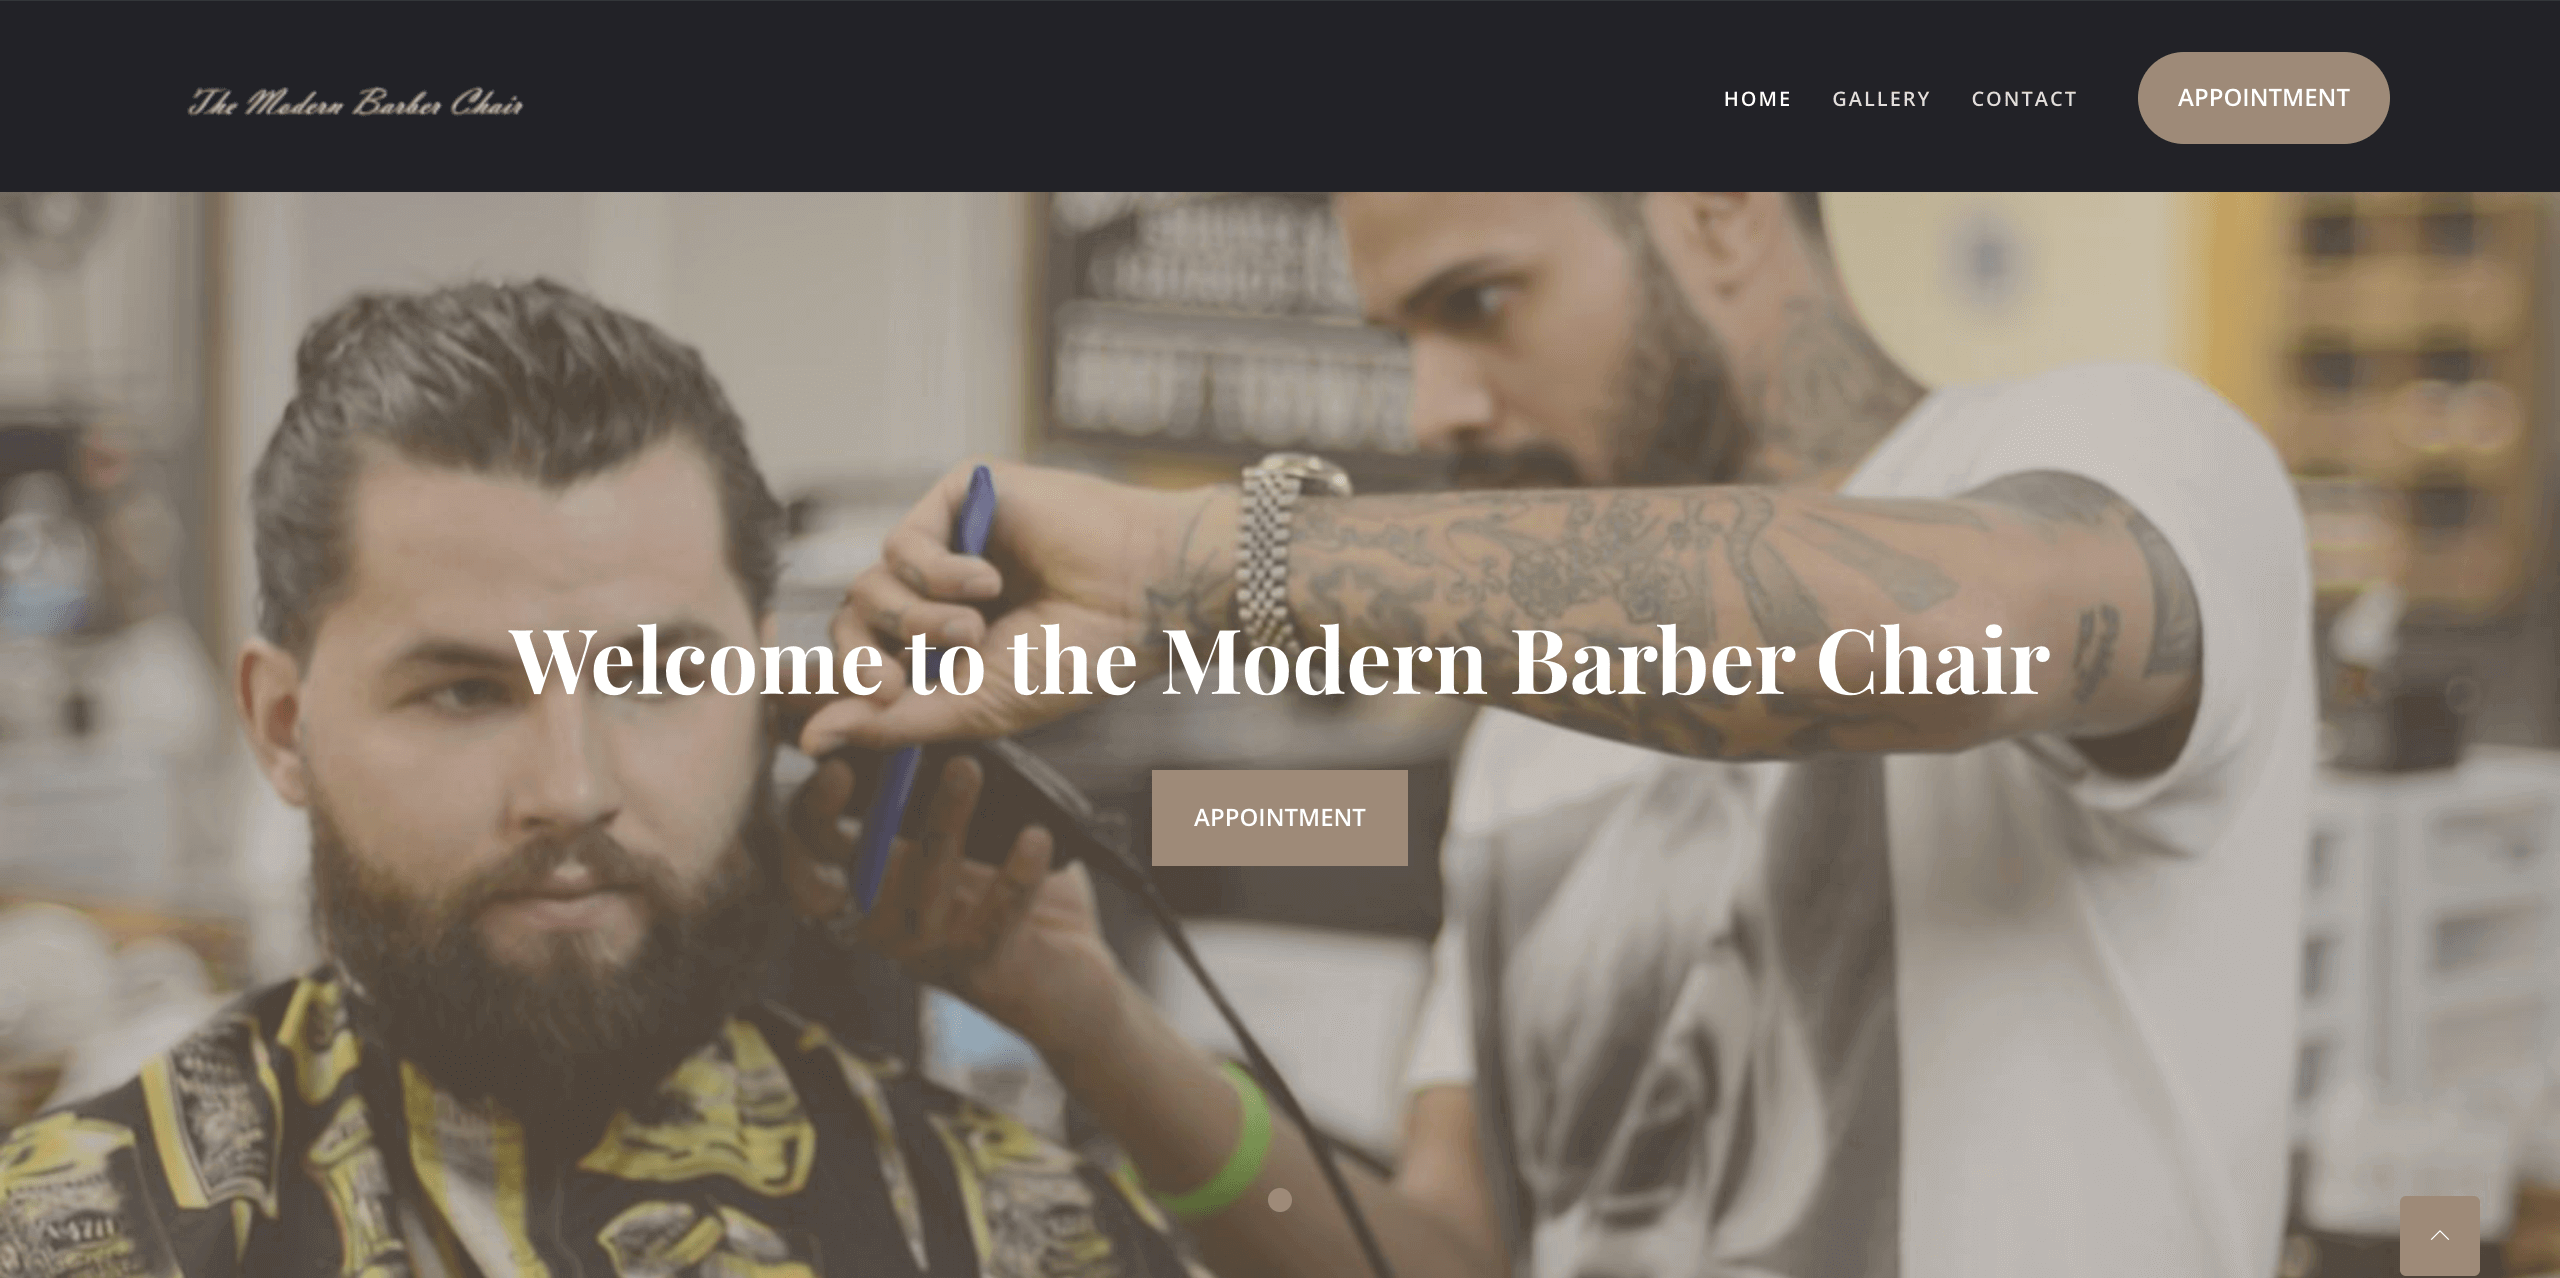 The Modern Barber